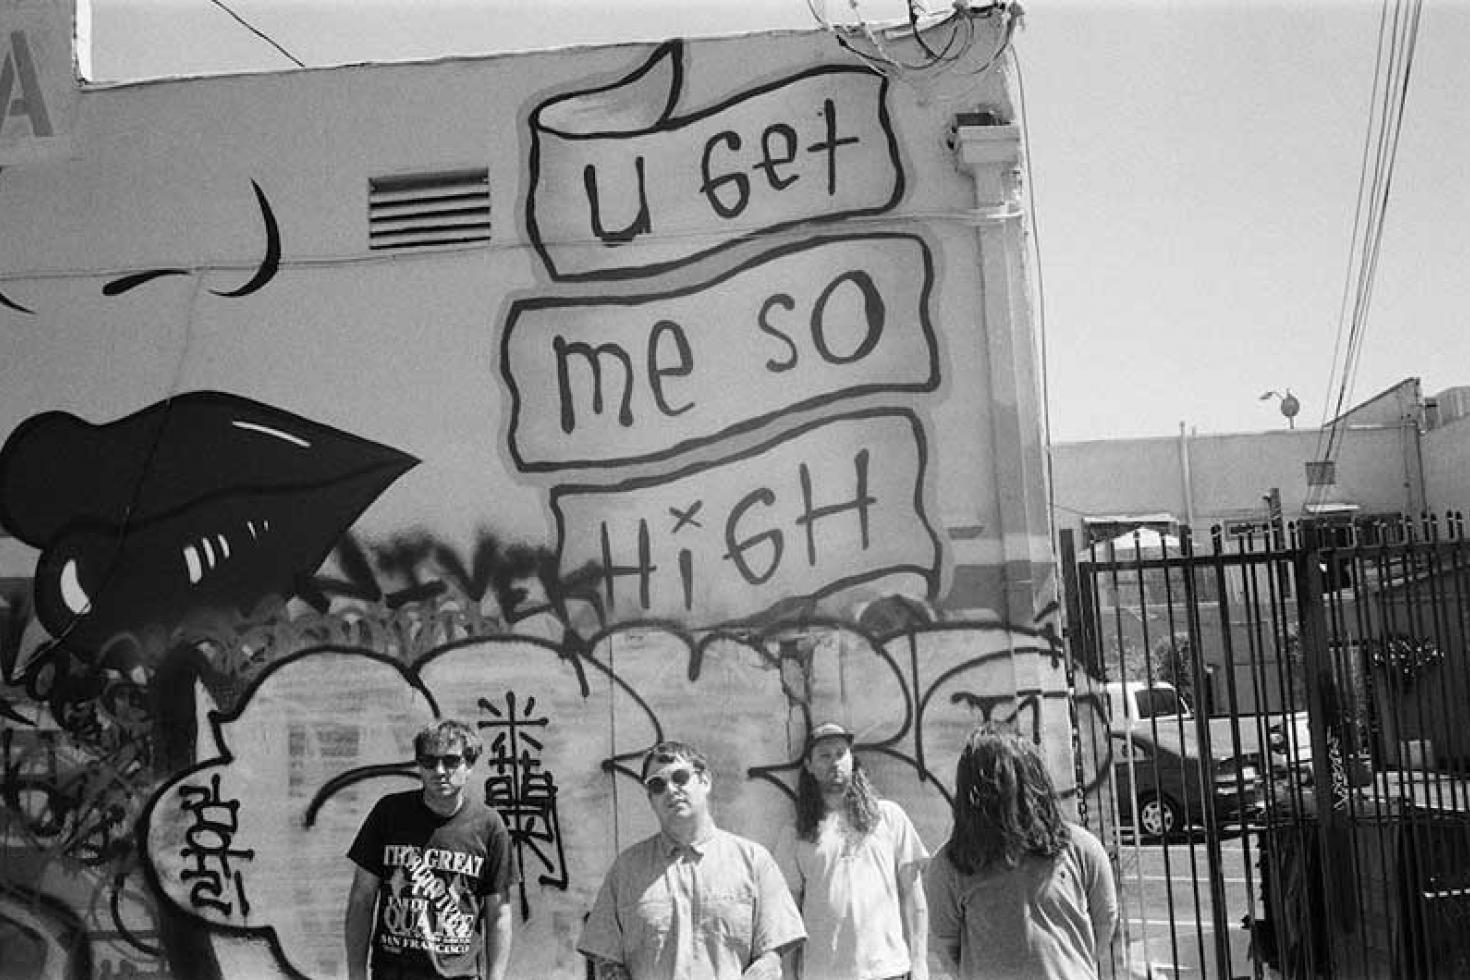 Culture Abuse release new single 'Goo'